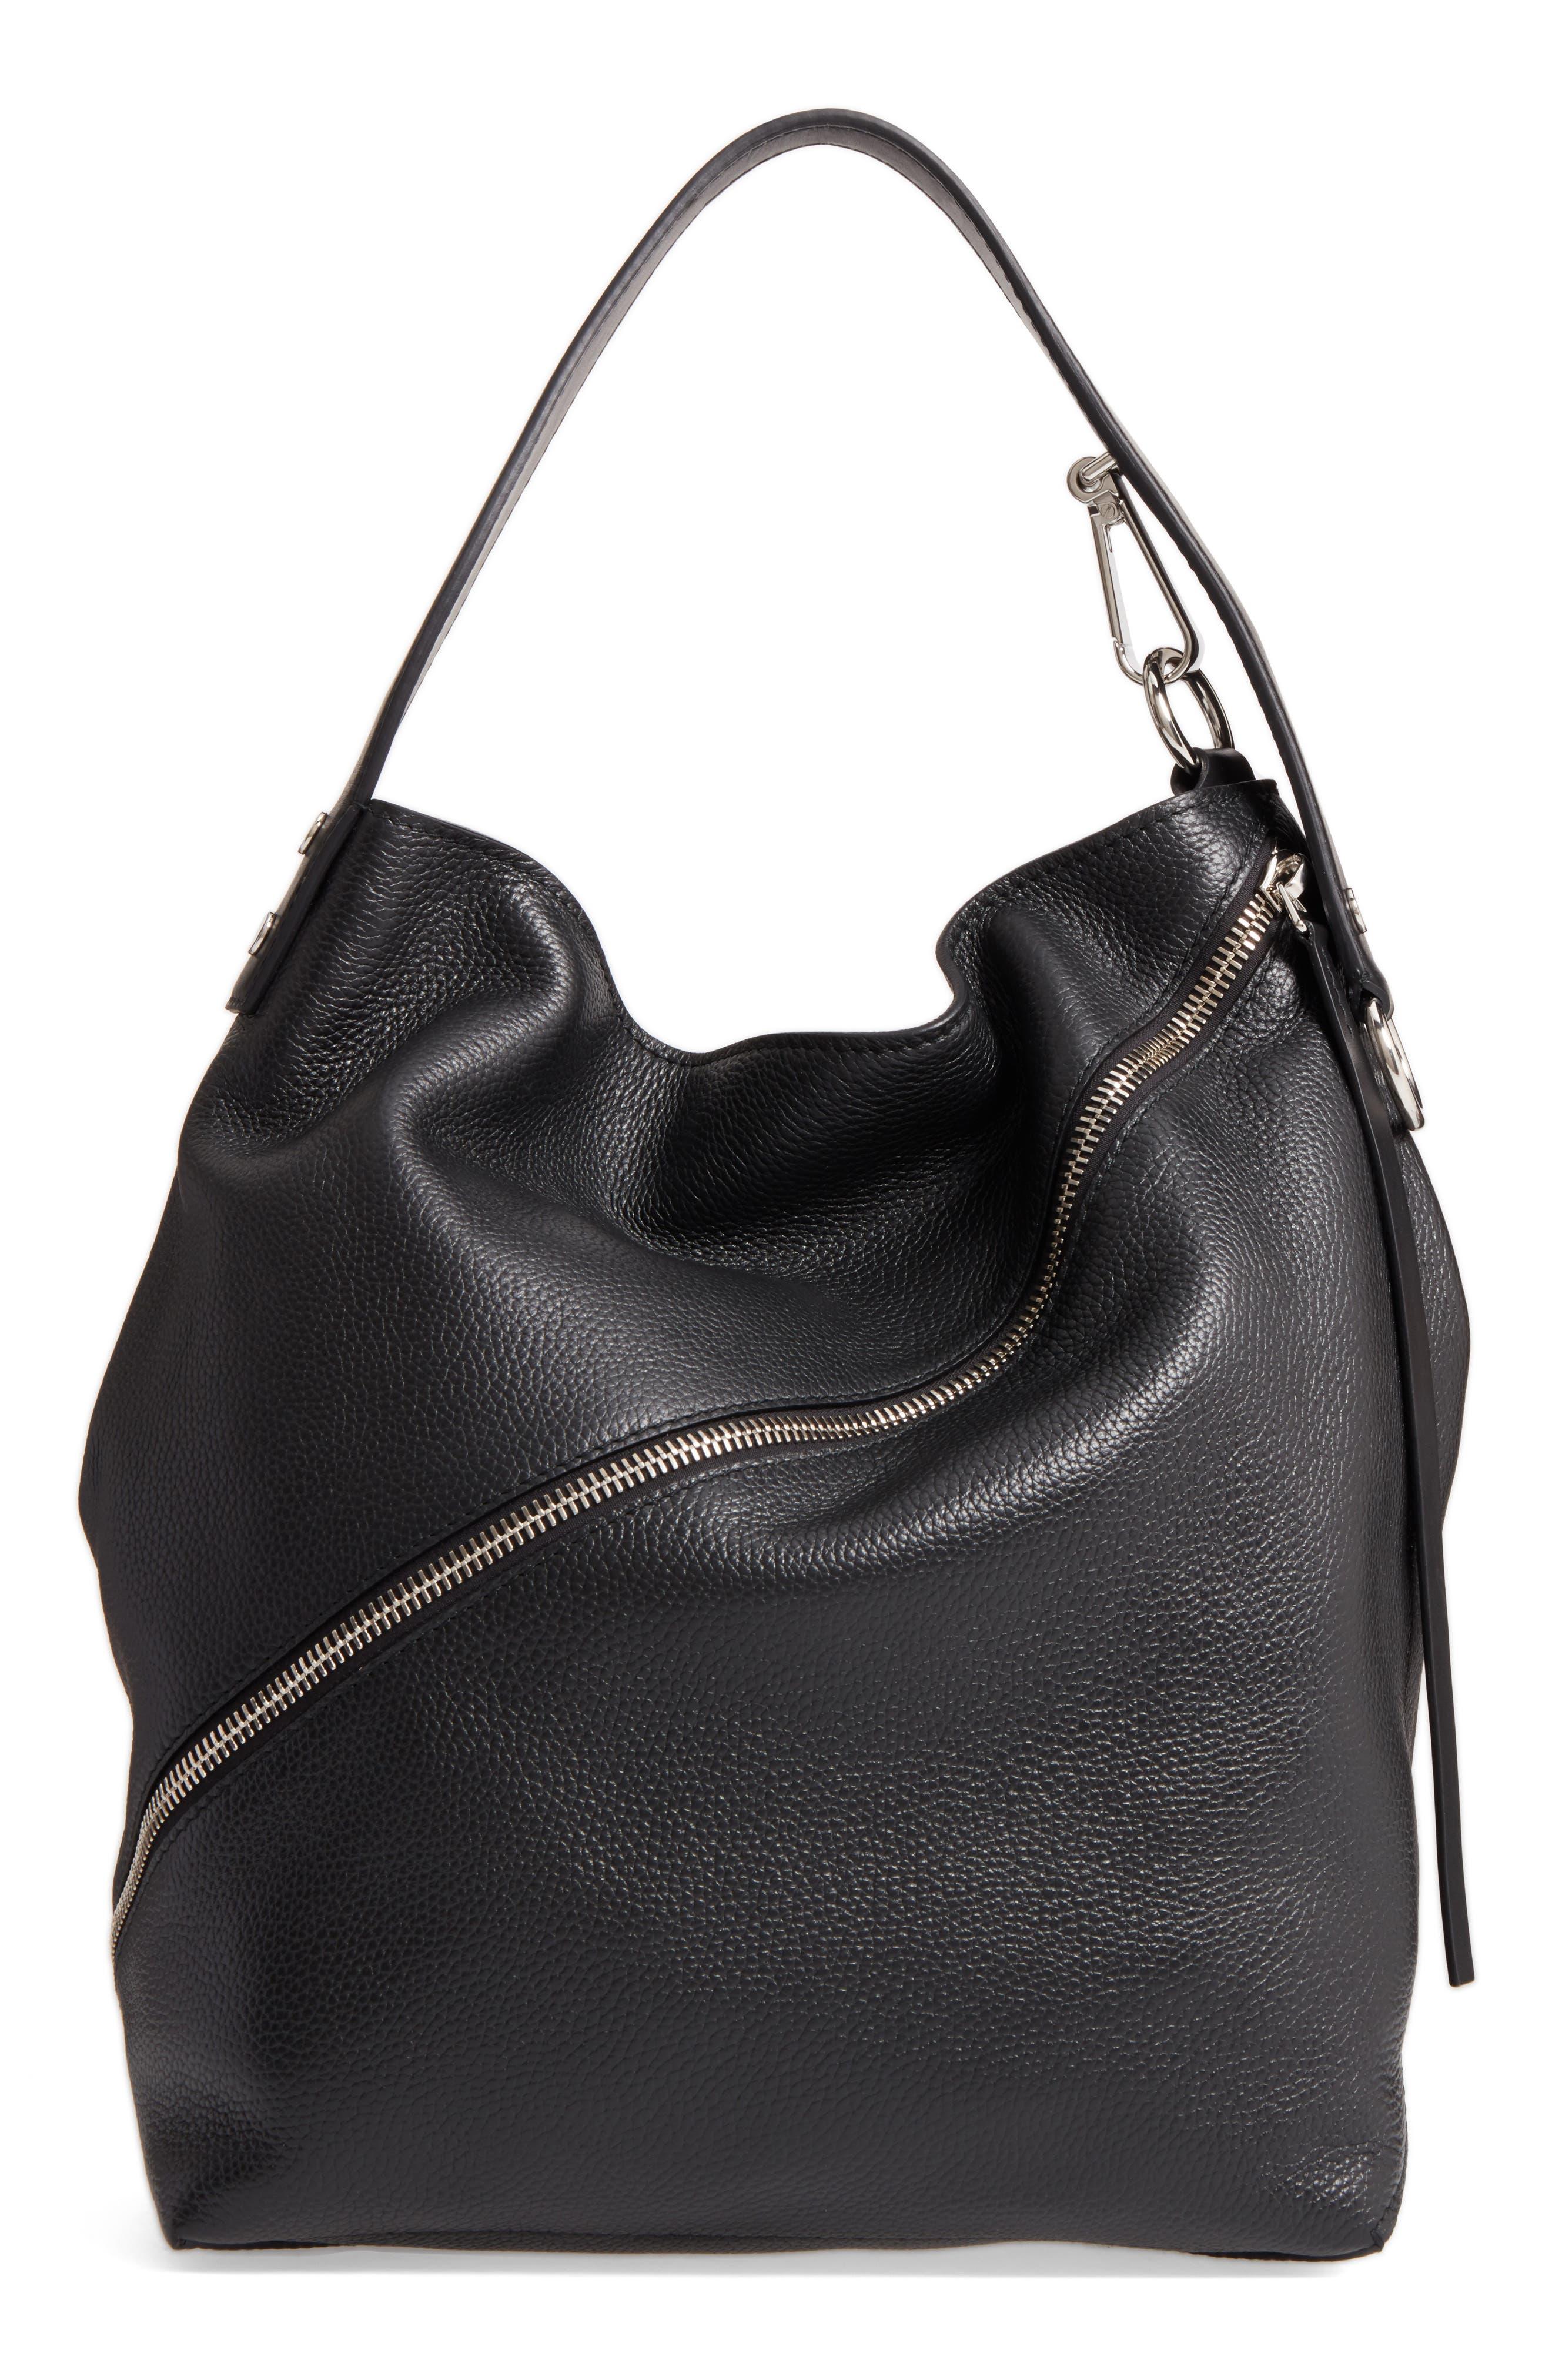 Proenza Schouler Medium Leather Hobo Bag